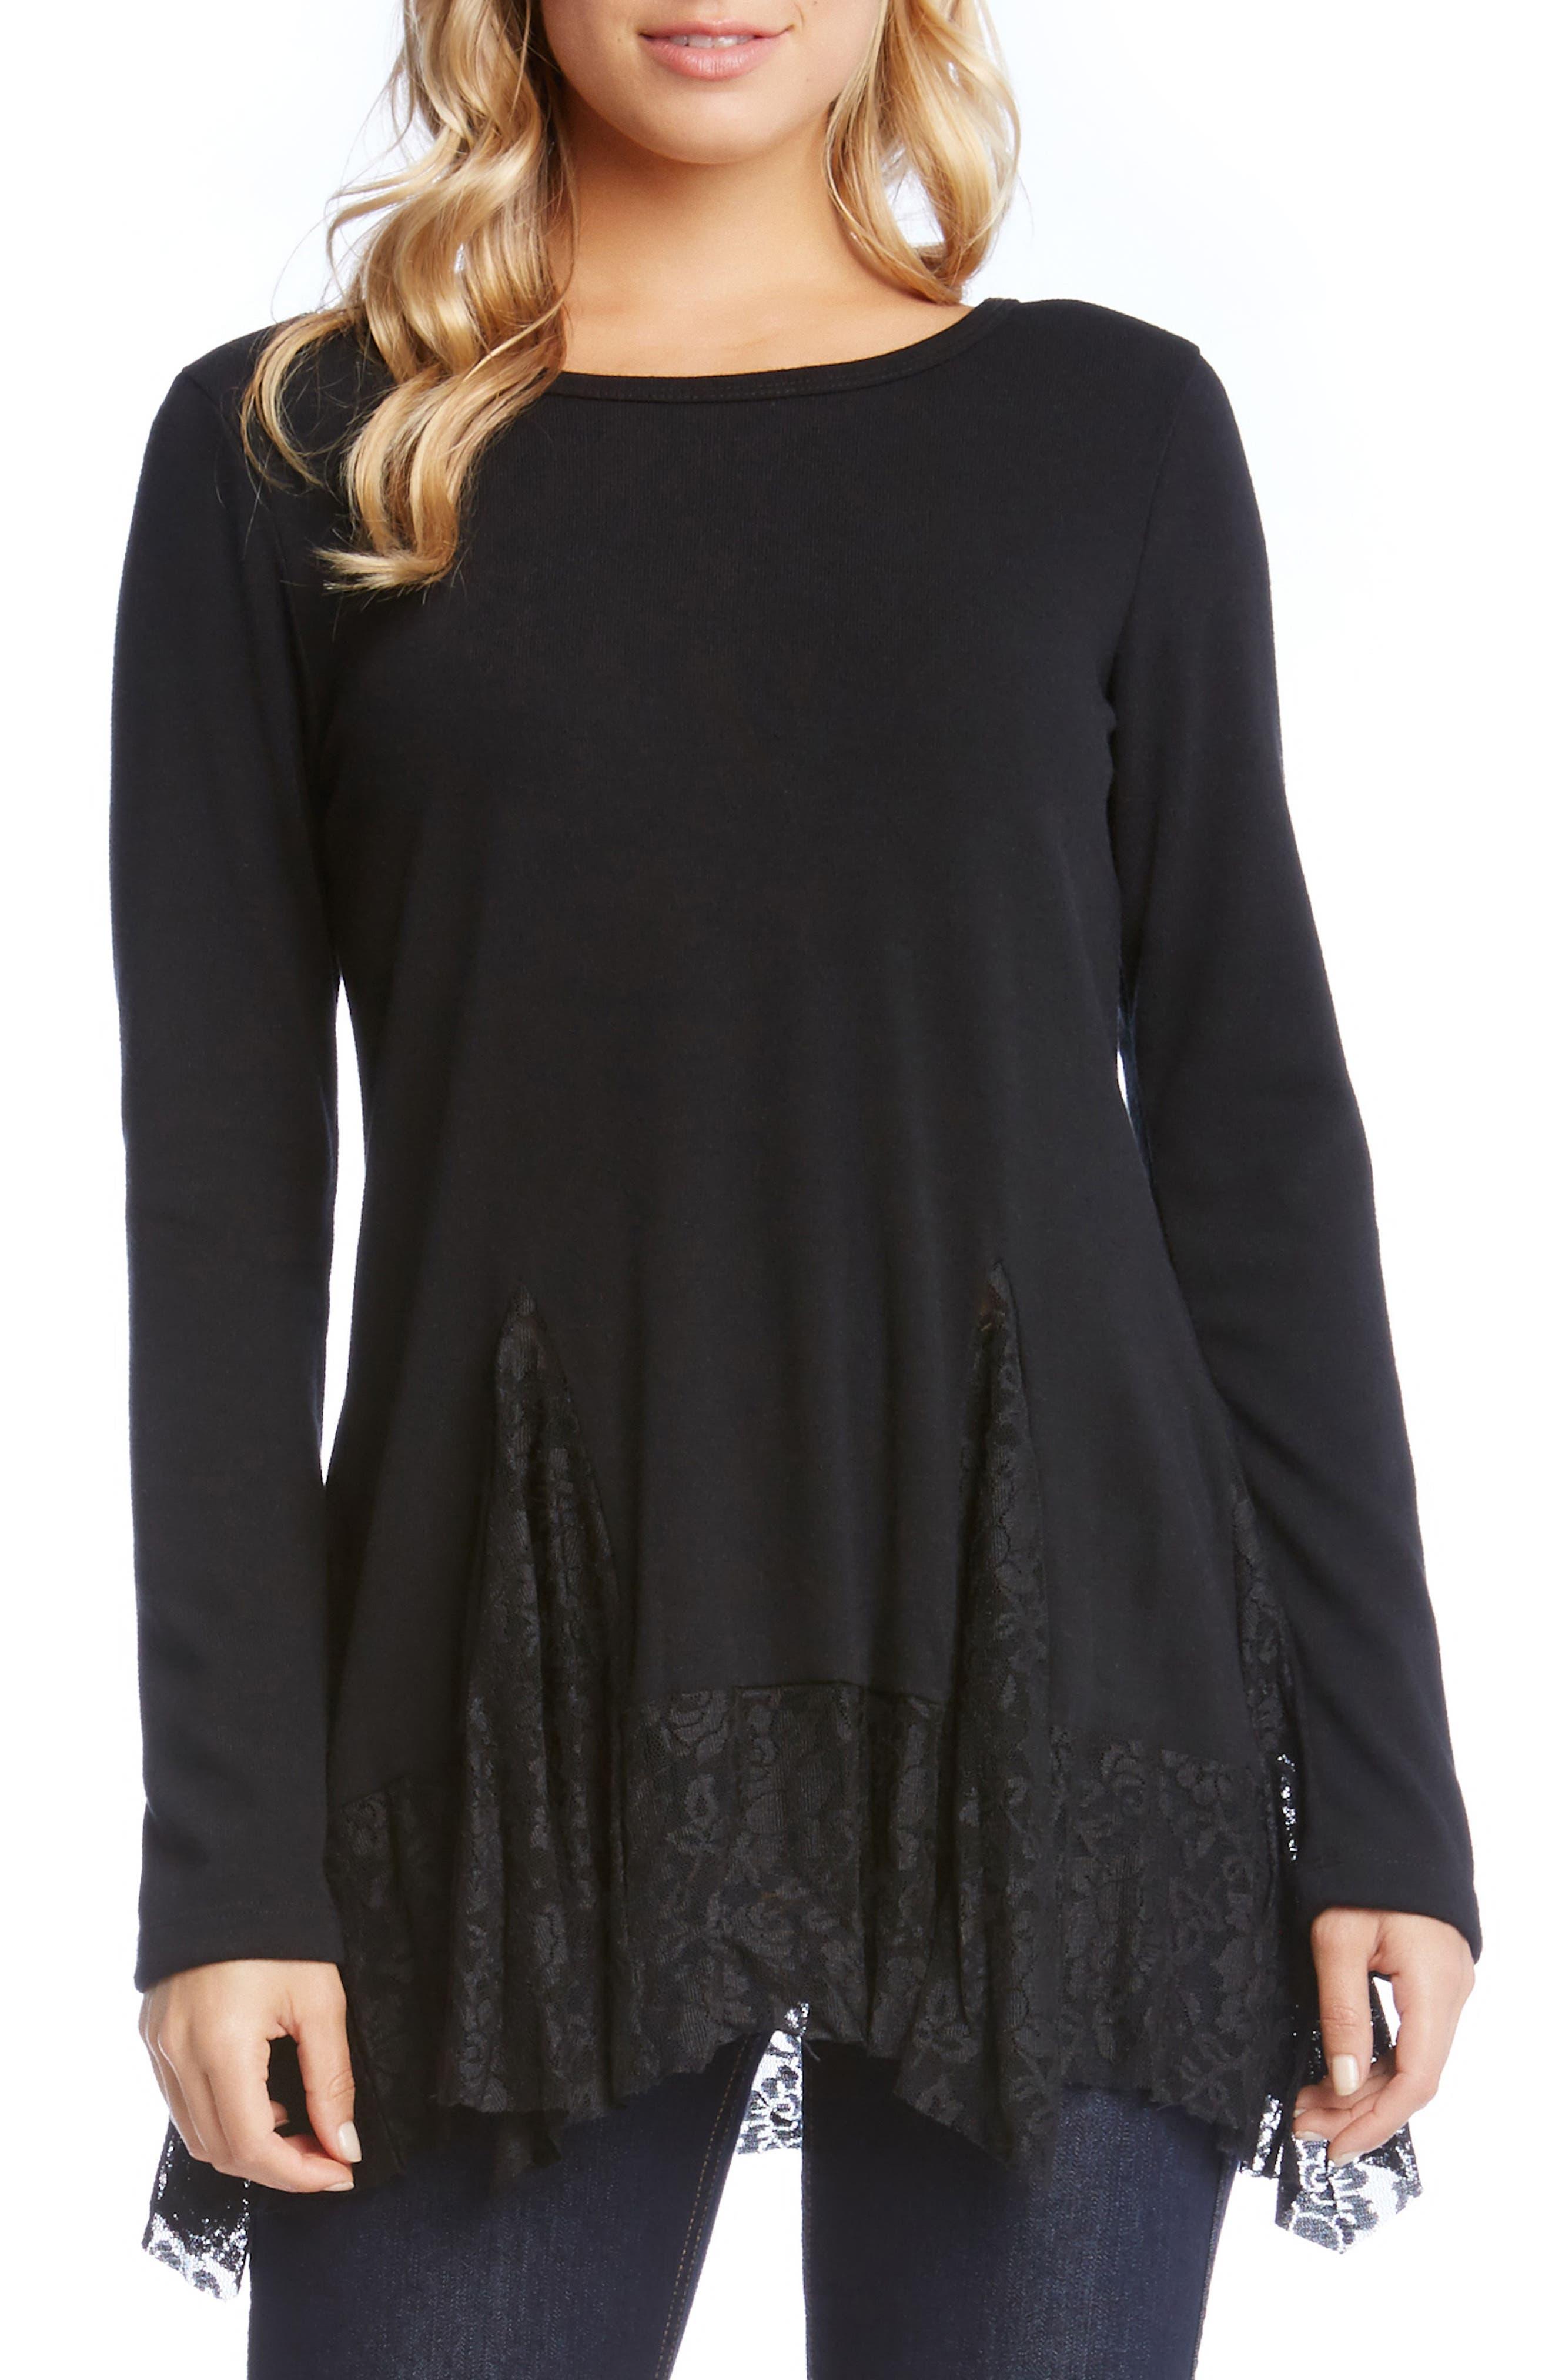 Karen Karen Lace Inset Sweater,                             Main thumbnail 1, color,                             Black